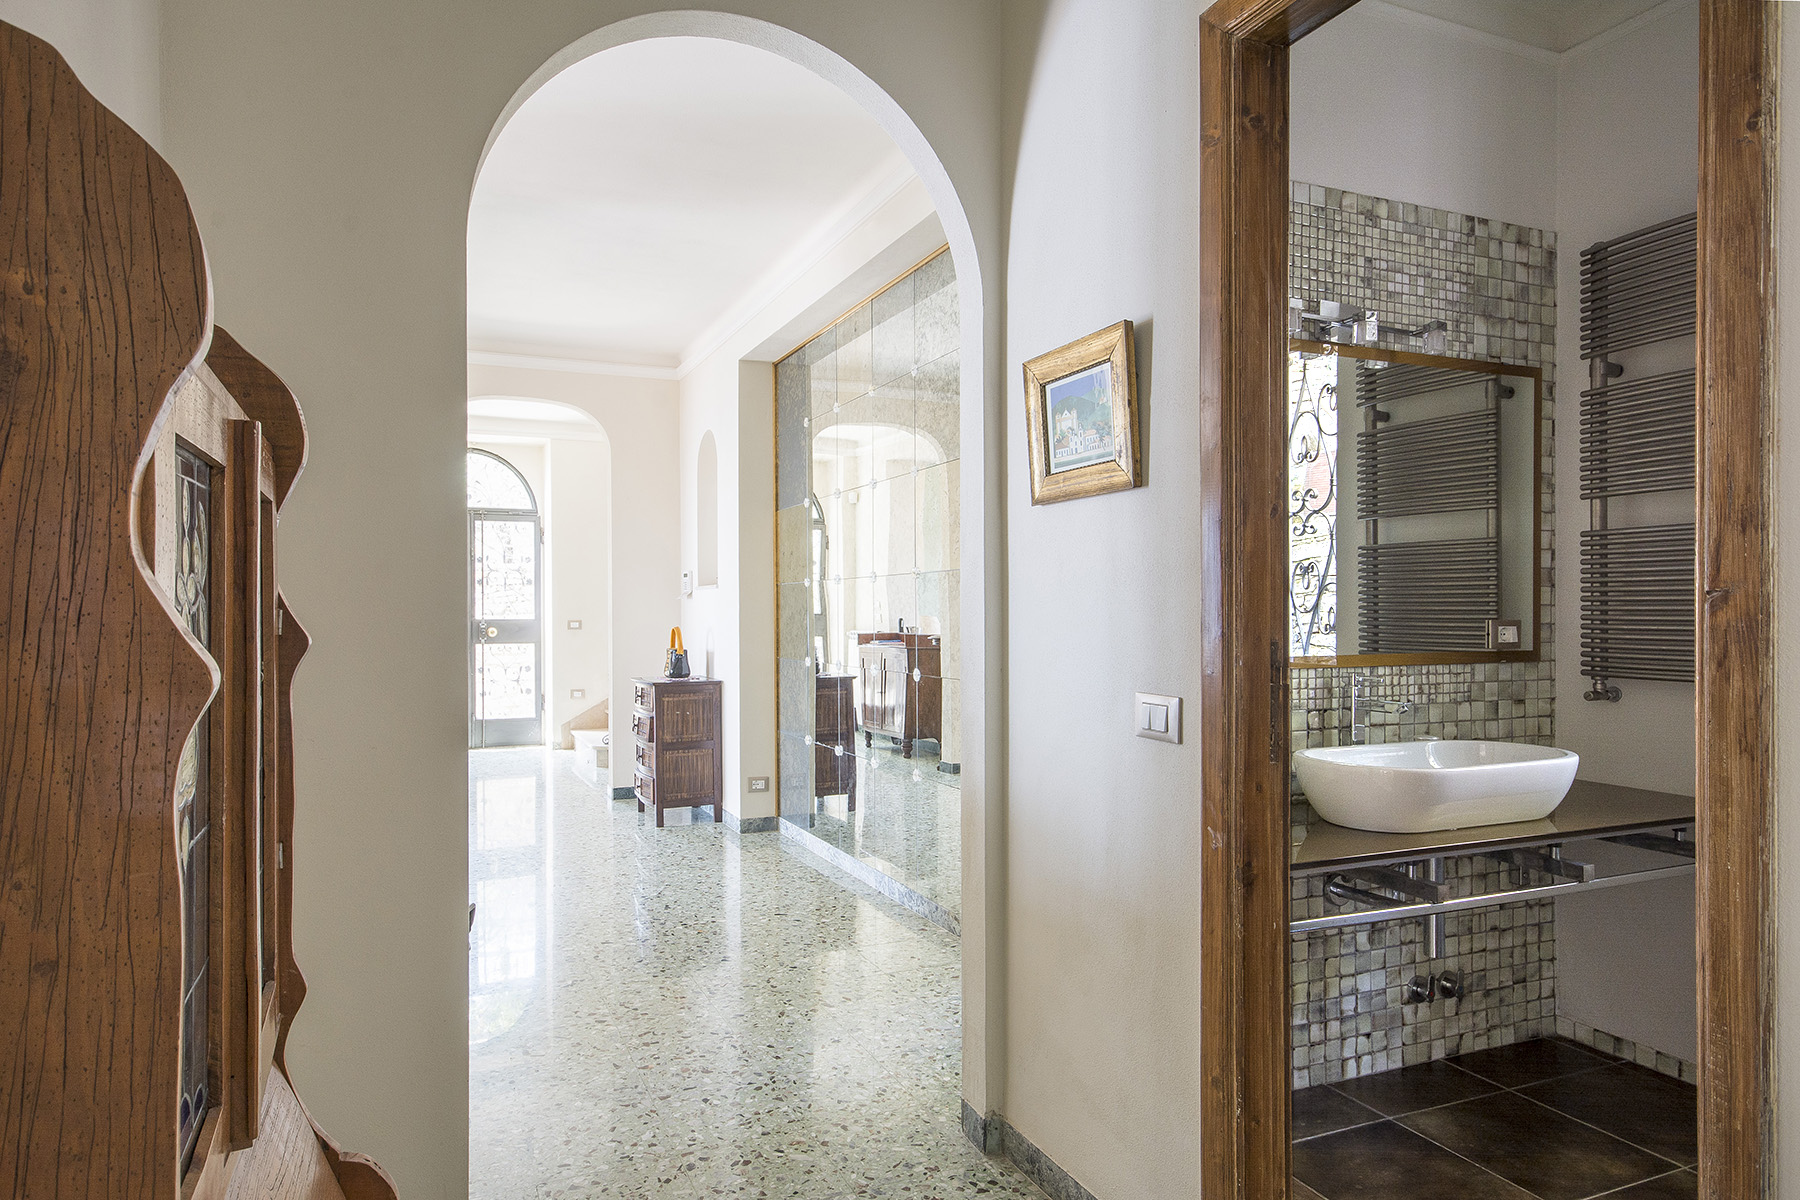 Villa in Vendita a Lerici: 5 locali, 580 mq - Foto 7